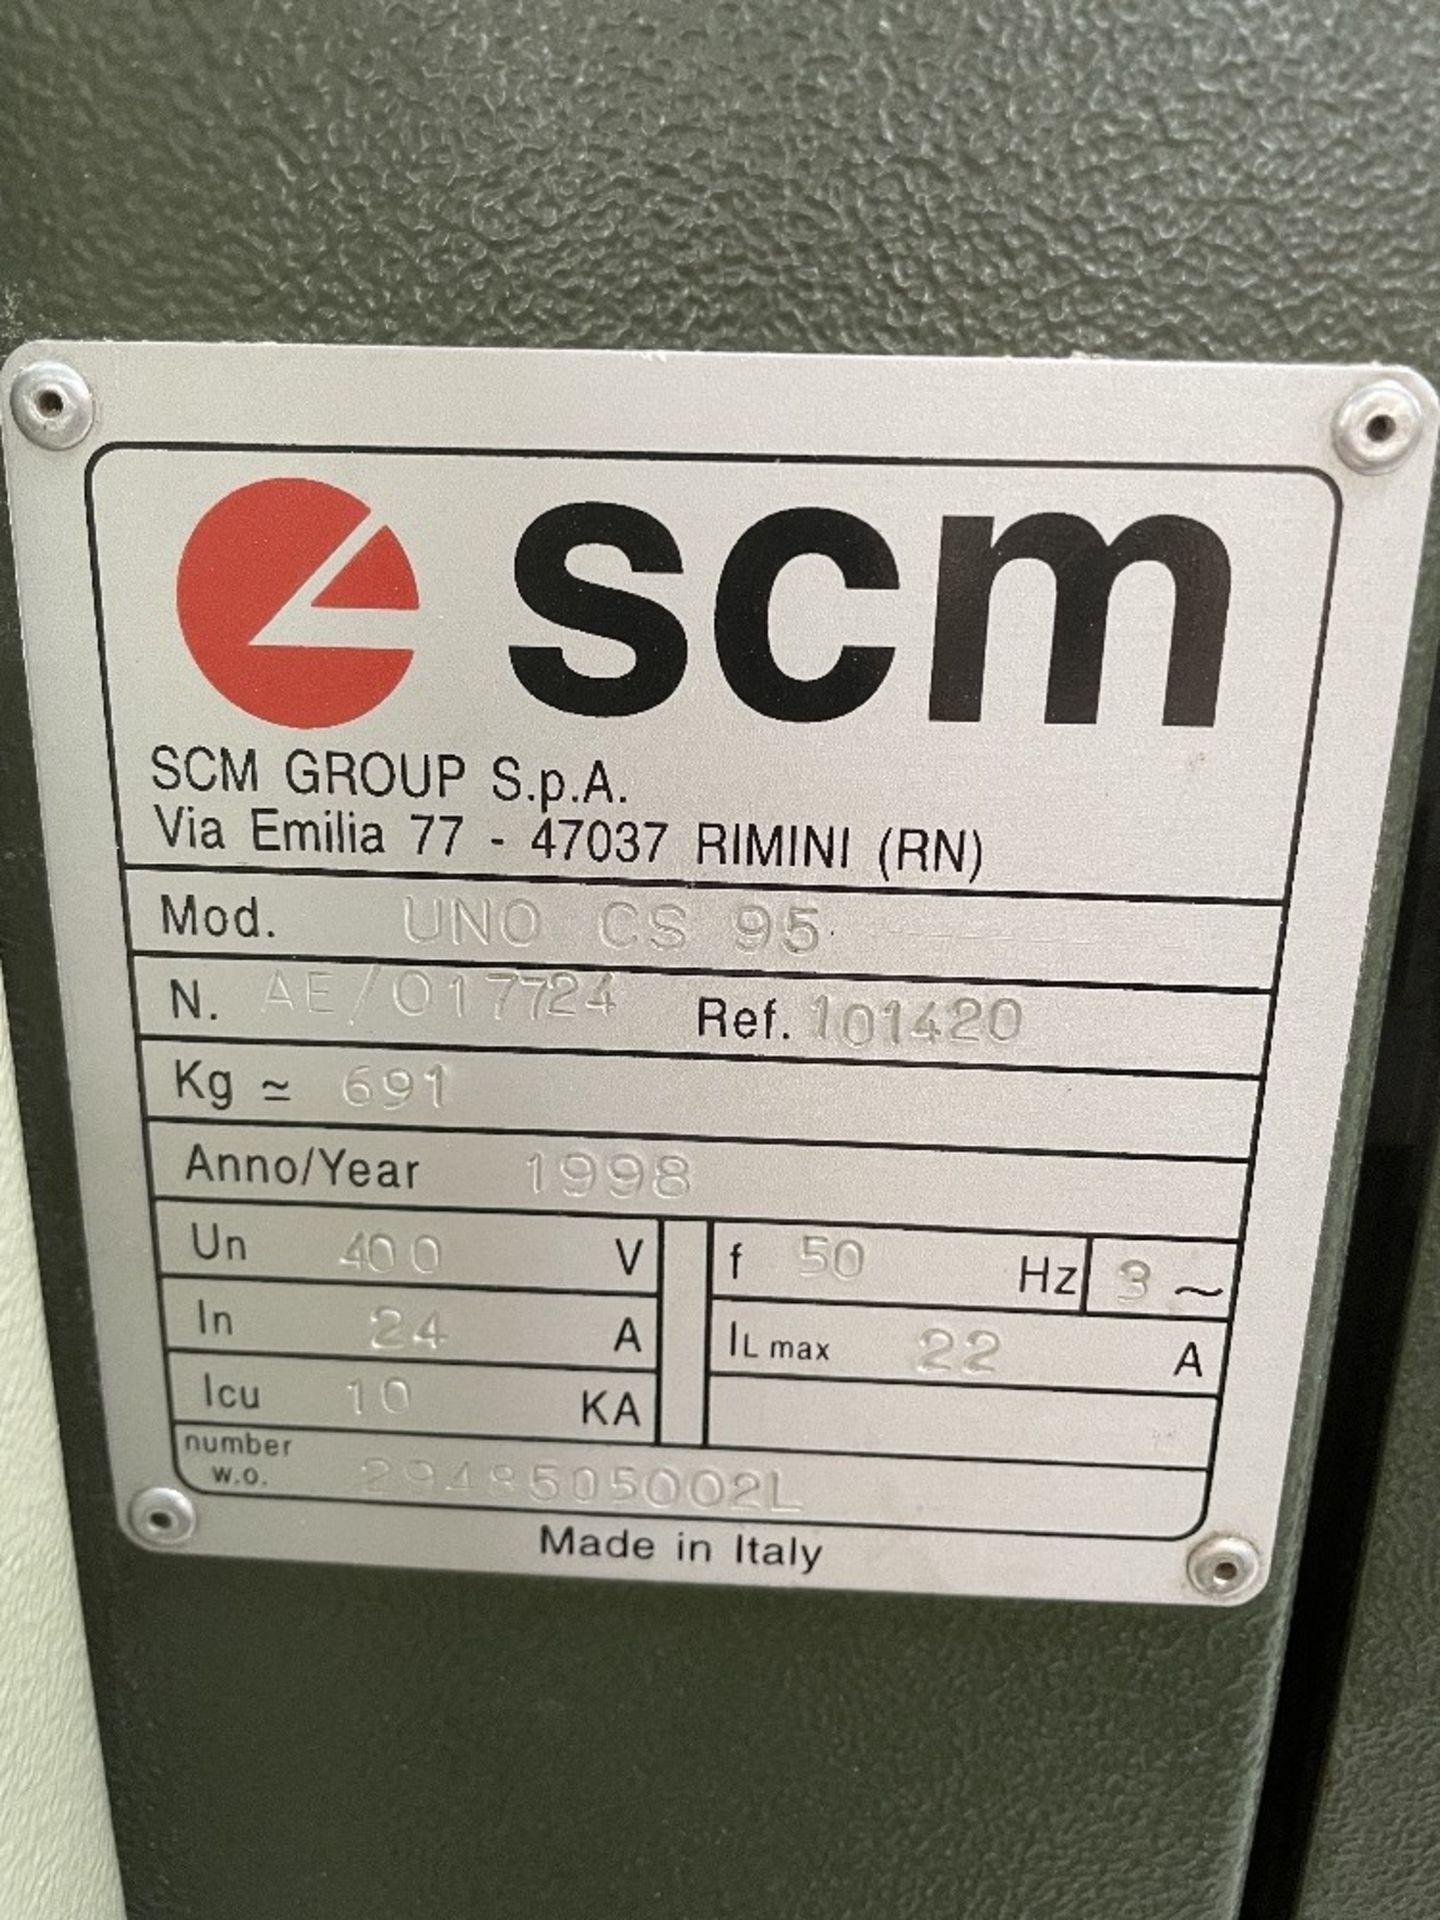 SCM Sandya 1K UNO CS 95 Drum Sander | YOM: 1998 - Image 2 of 7